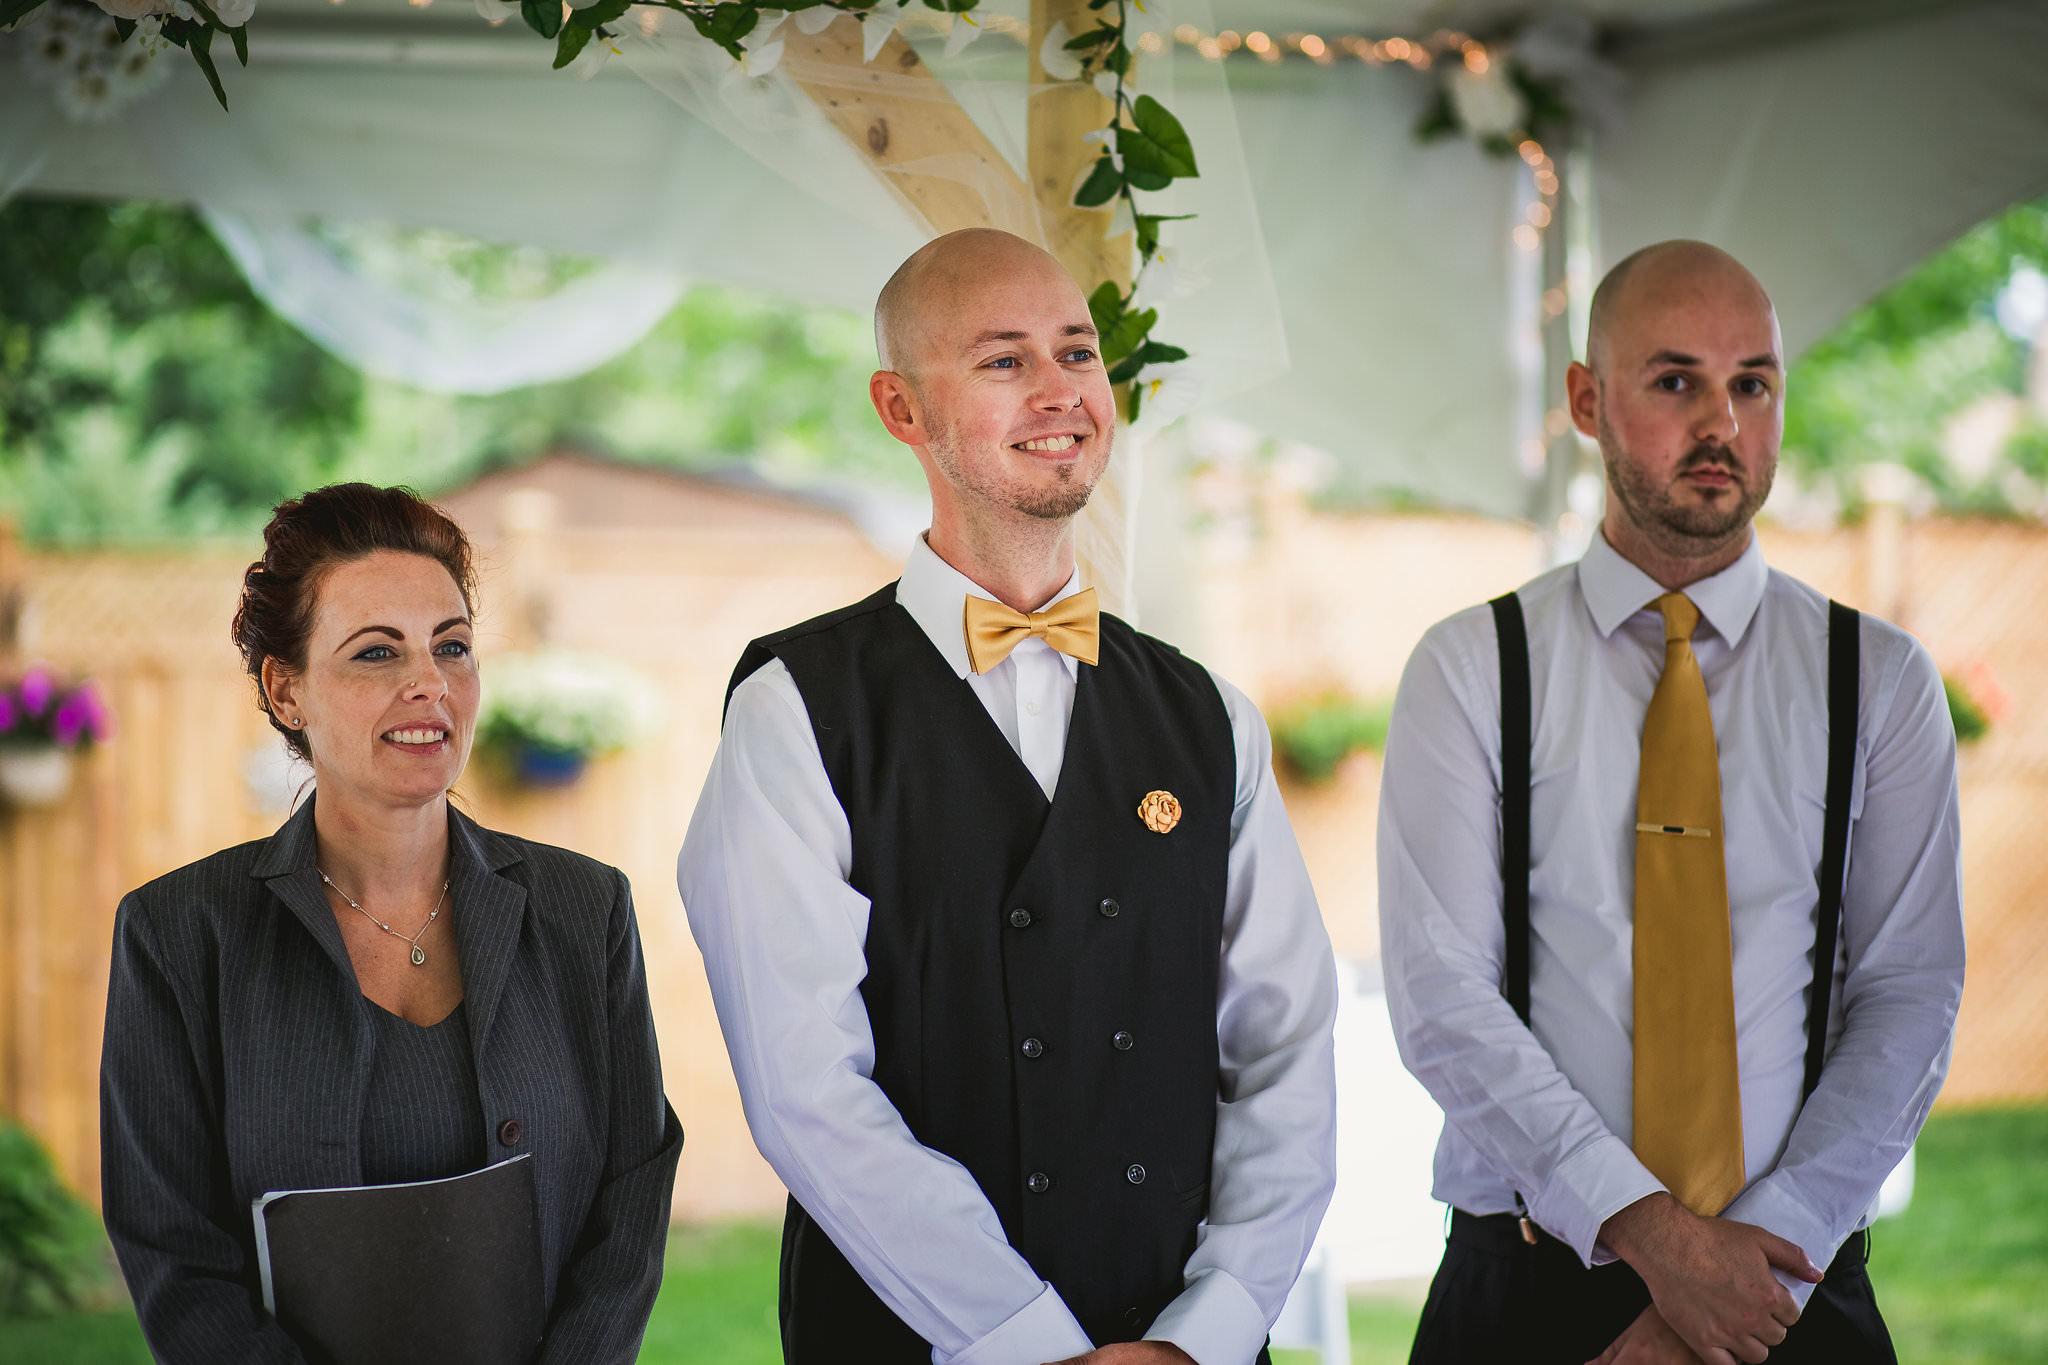 Kristen Adam Kindred Loft Whitby Wedding Photos 141 - Durham Wedding Photographer: Kindred Loft Wedding Photos